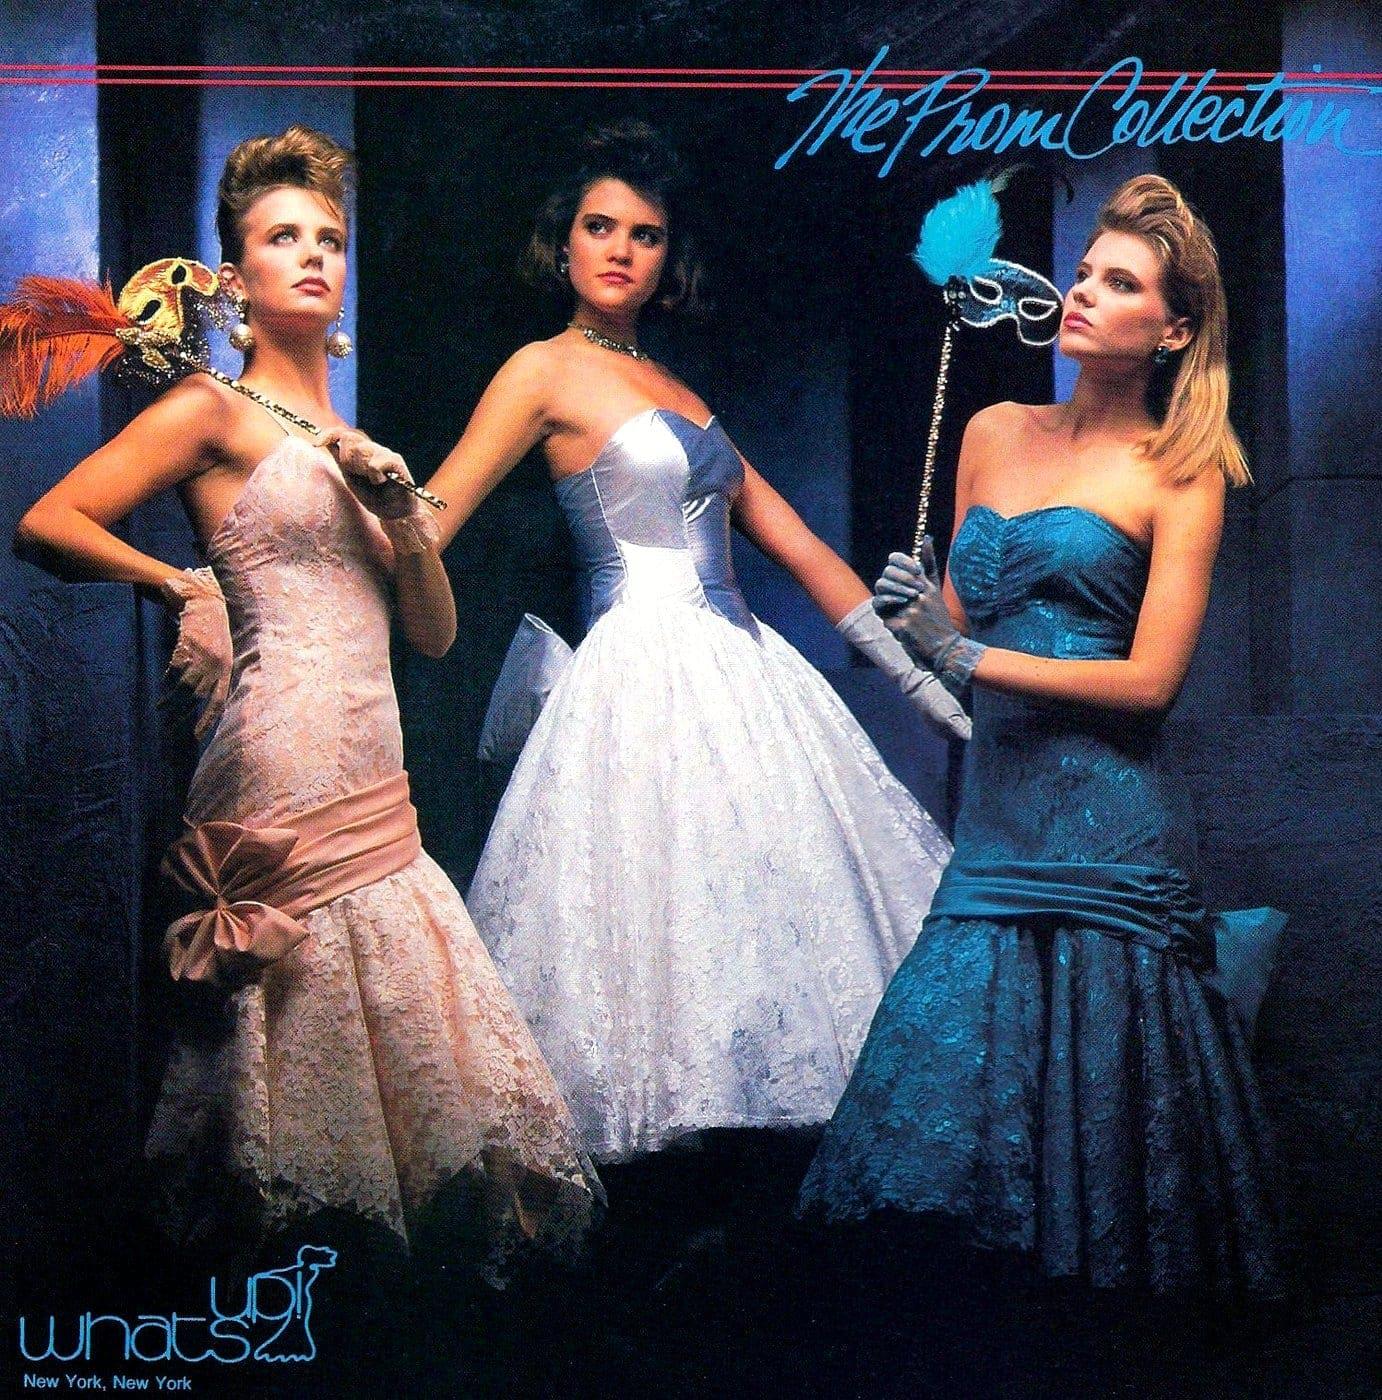 Vintage 80s prom dresses (4)